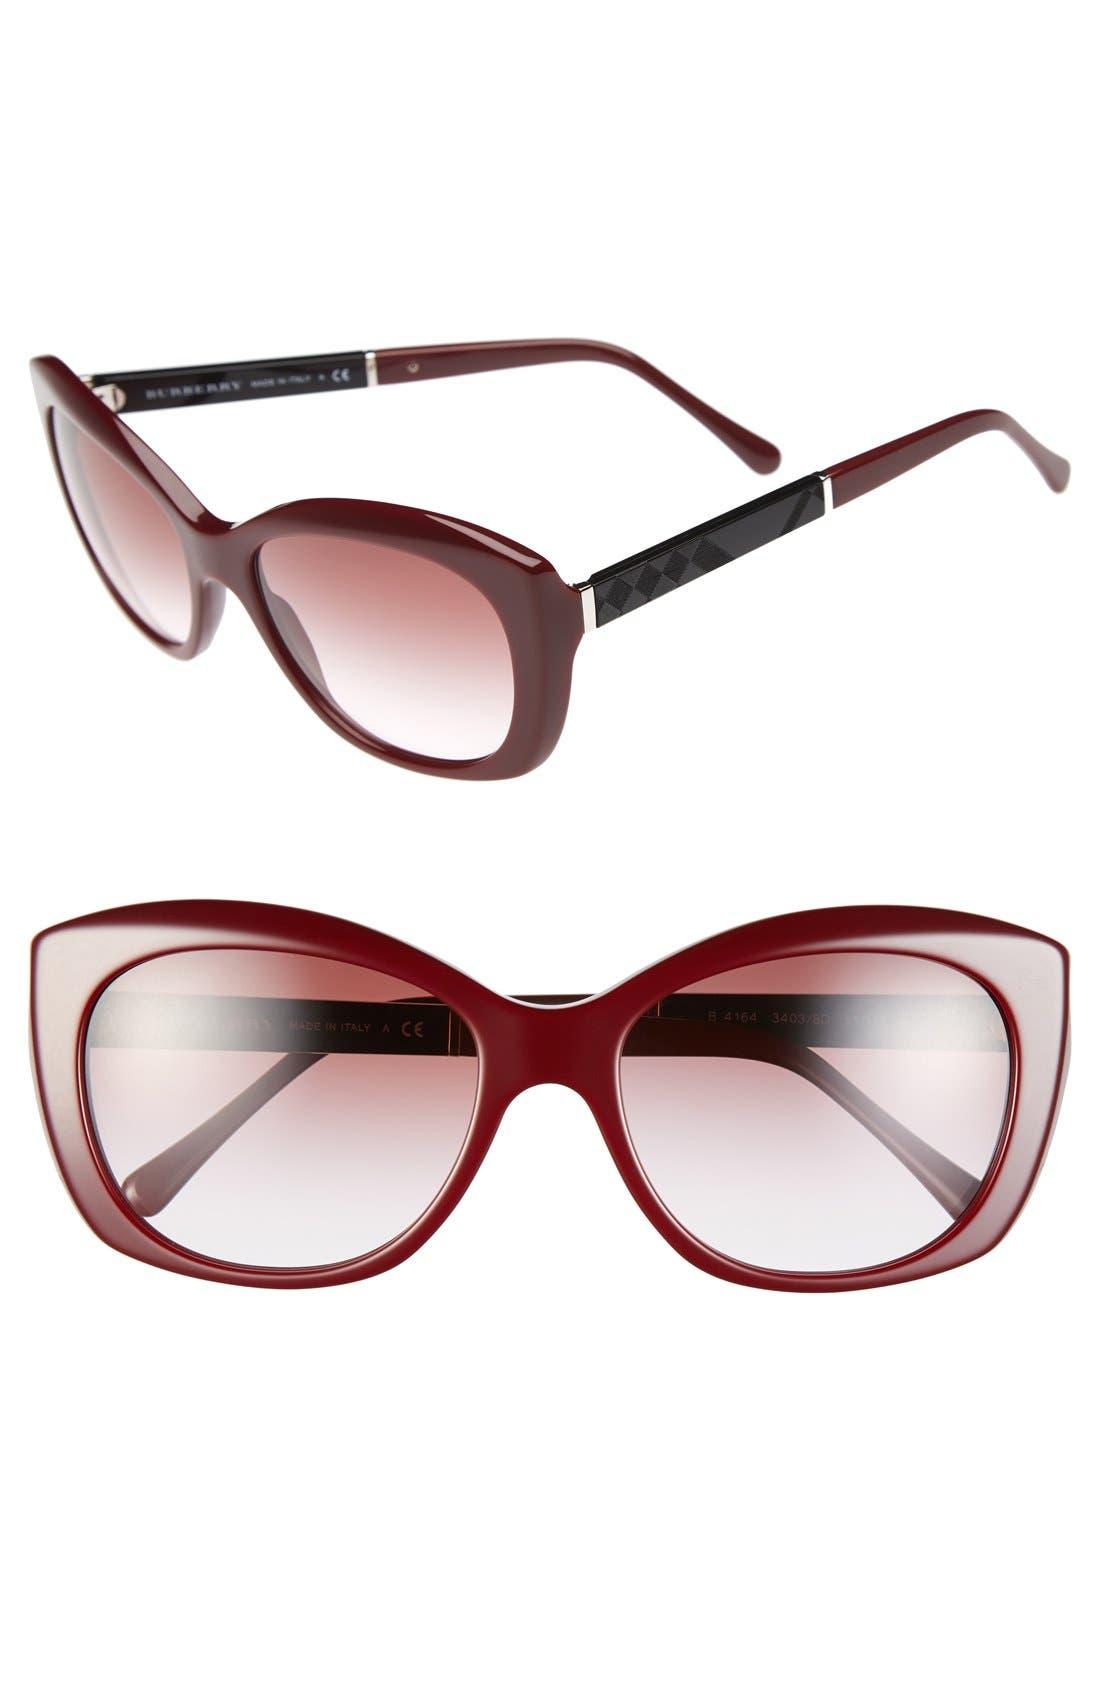 Alternate Image 1 Selected - Burberry 55mm Sunglasses